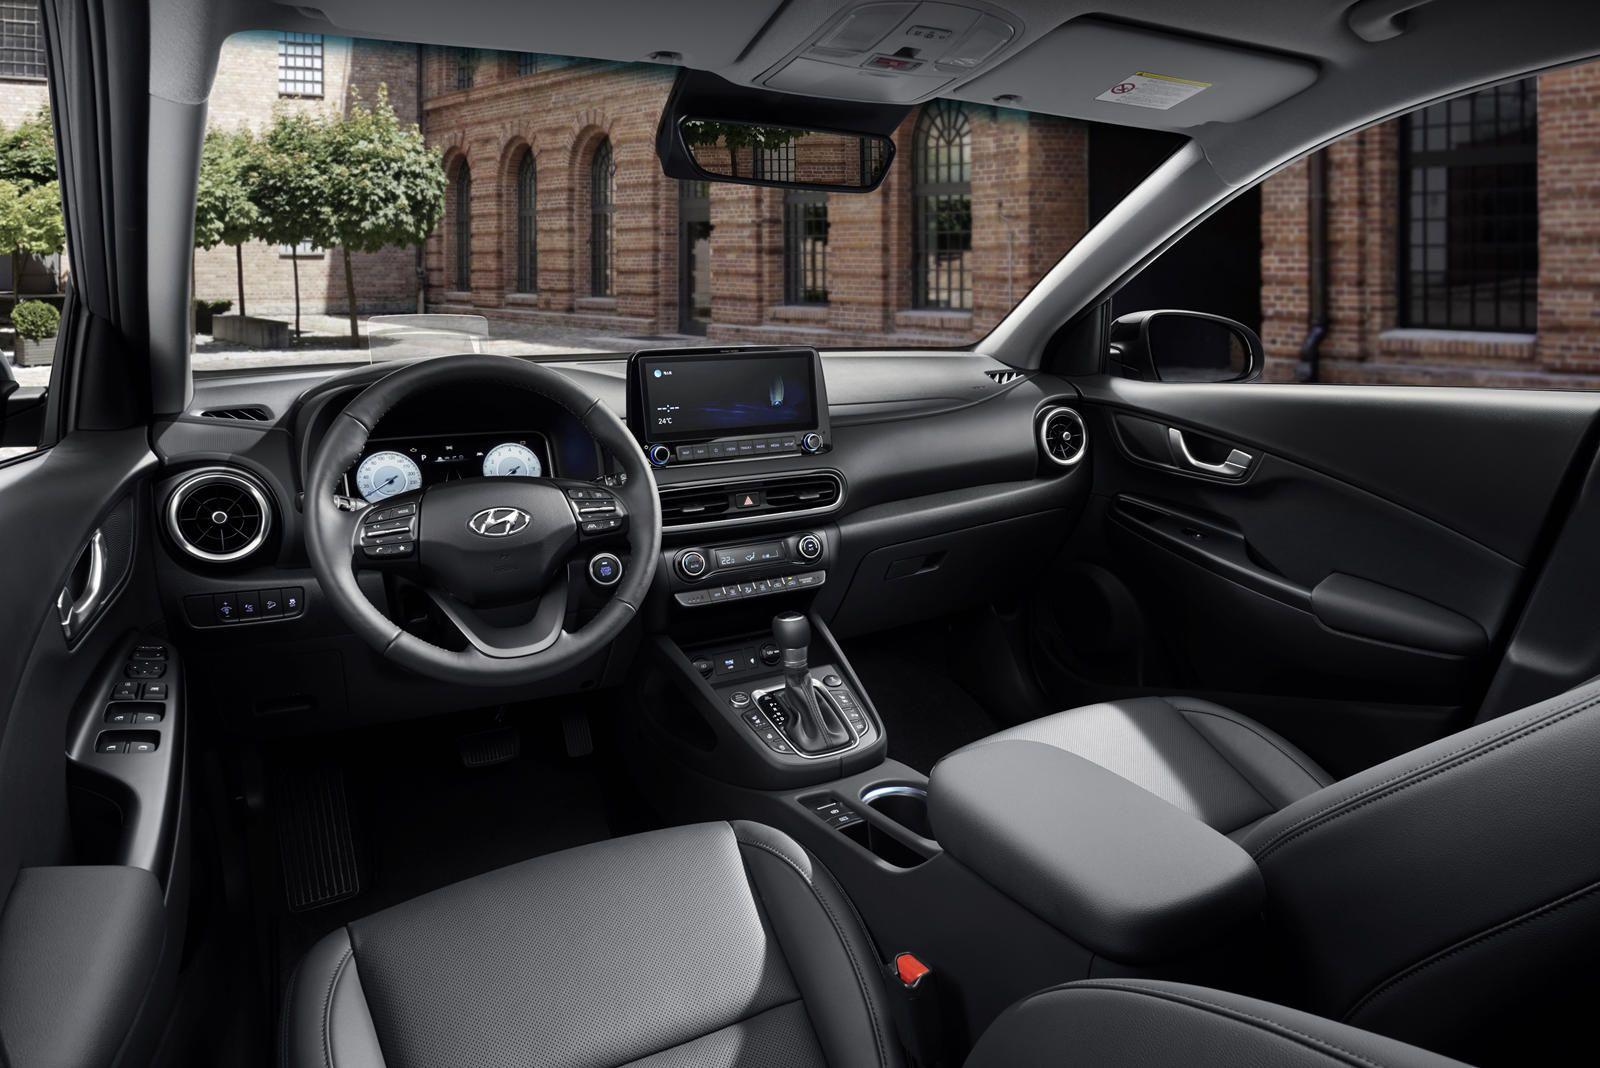 41+ Hyundai kona 2020 interior trends